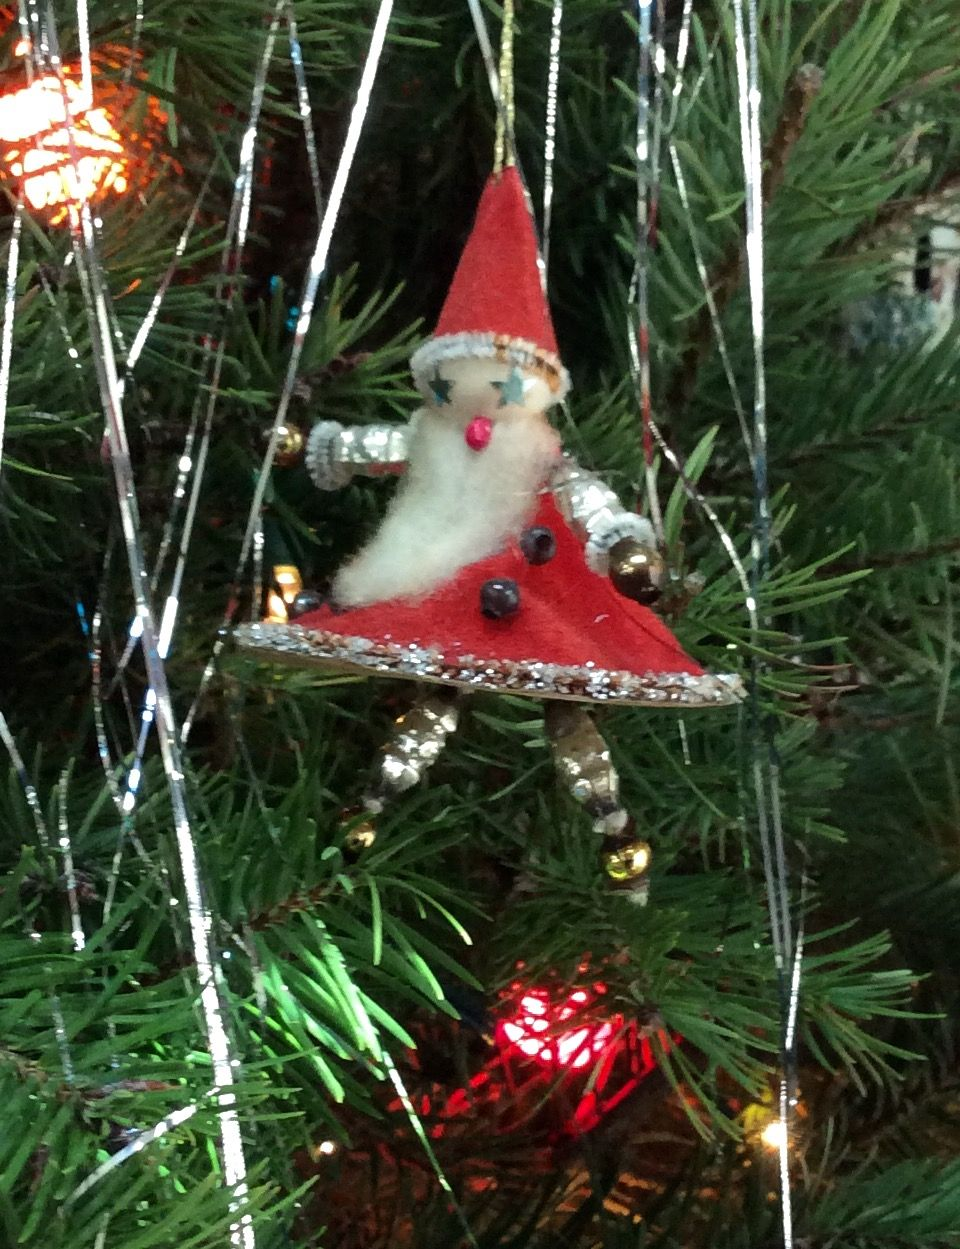 Trim Design Co A Christmas Tree Decorated With Handmade Origami Cranes Nods To The Homeowne Origami Christmas Tree Christmas Tree Decorations Decorating Blogs